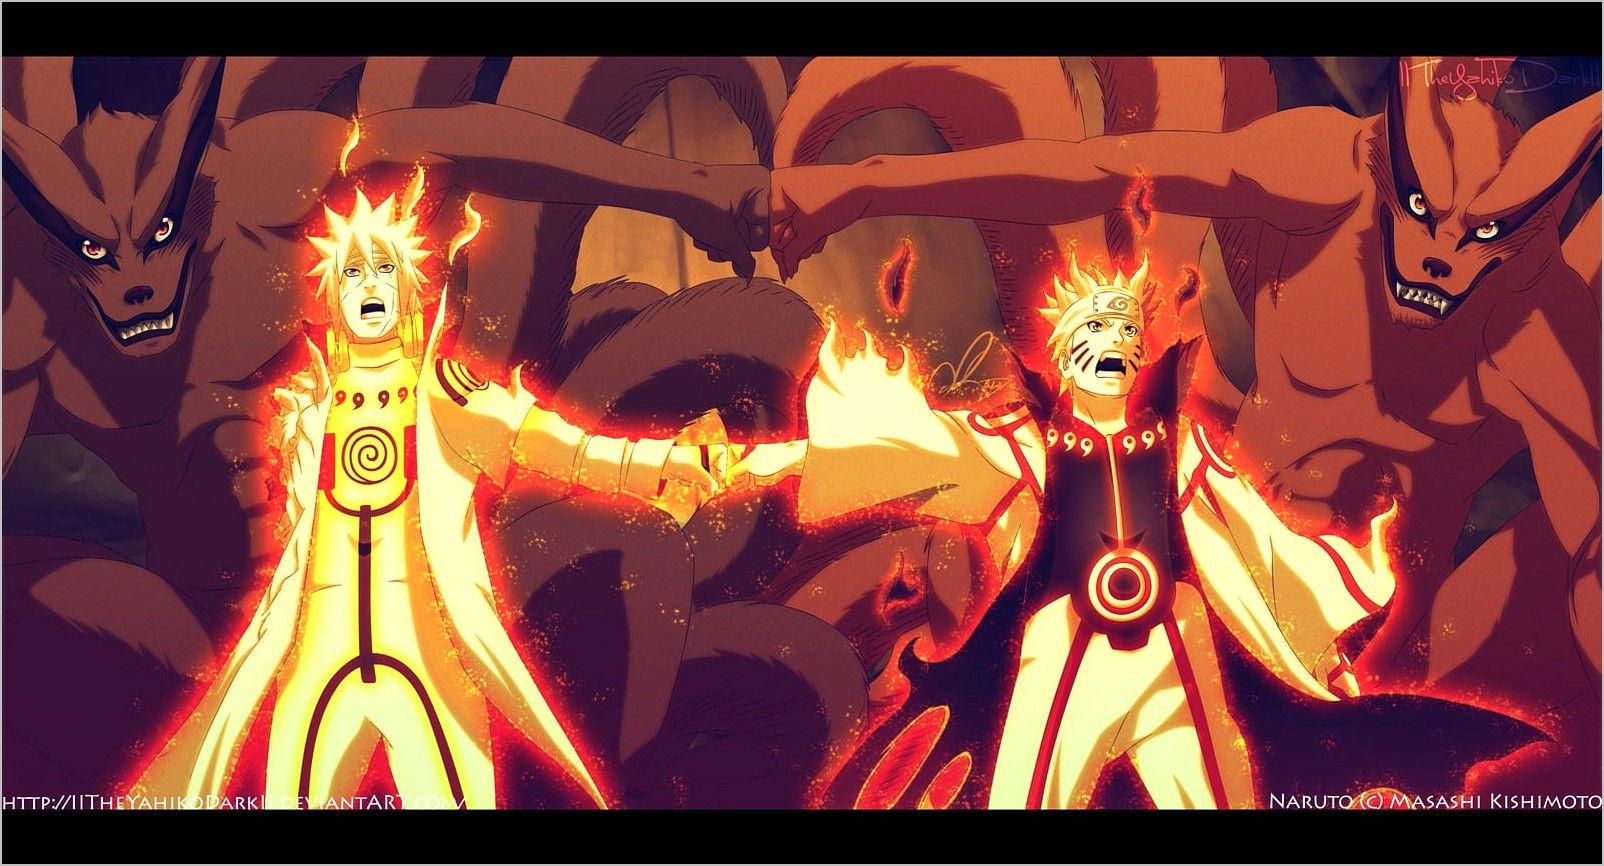 Naruto Minato Wallpaper 4k Arte De Naruto Fondo De Pantalla De Anime Minato Y Naruto